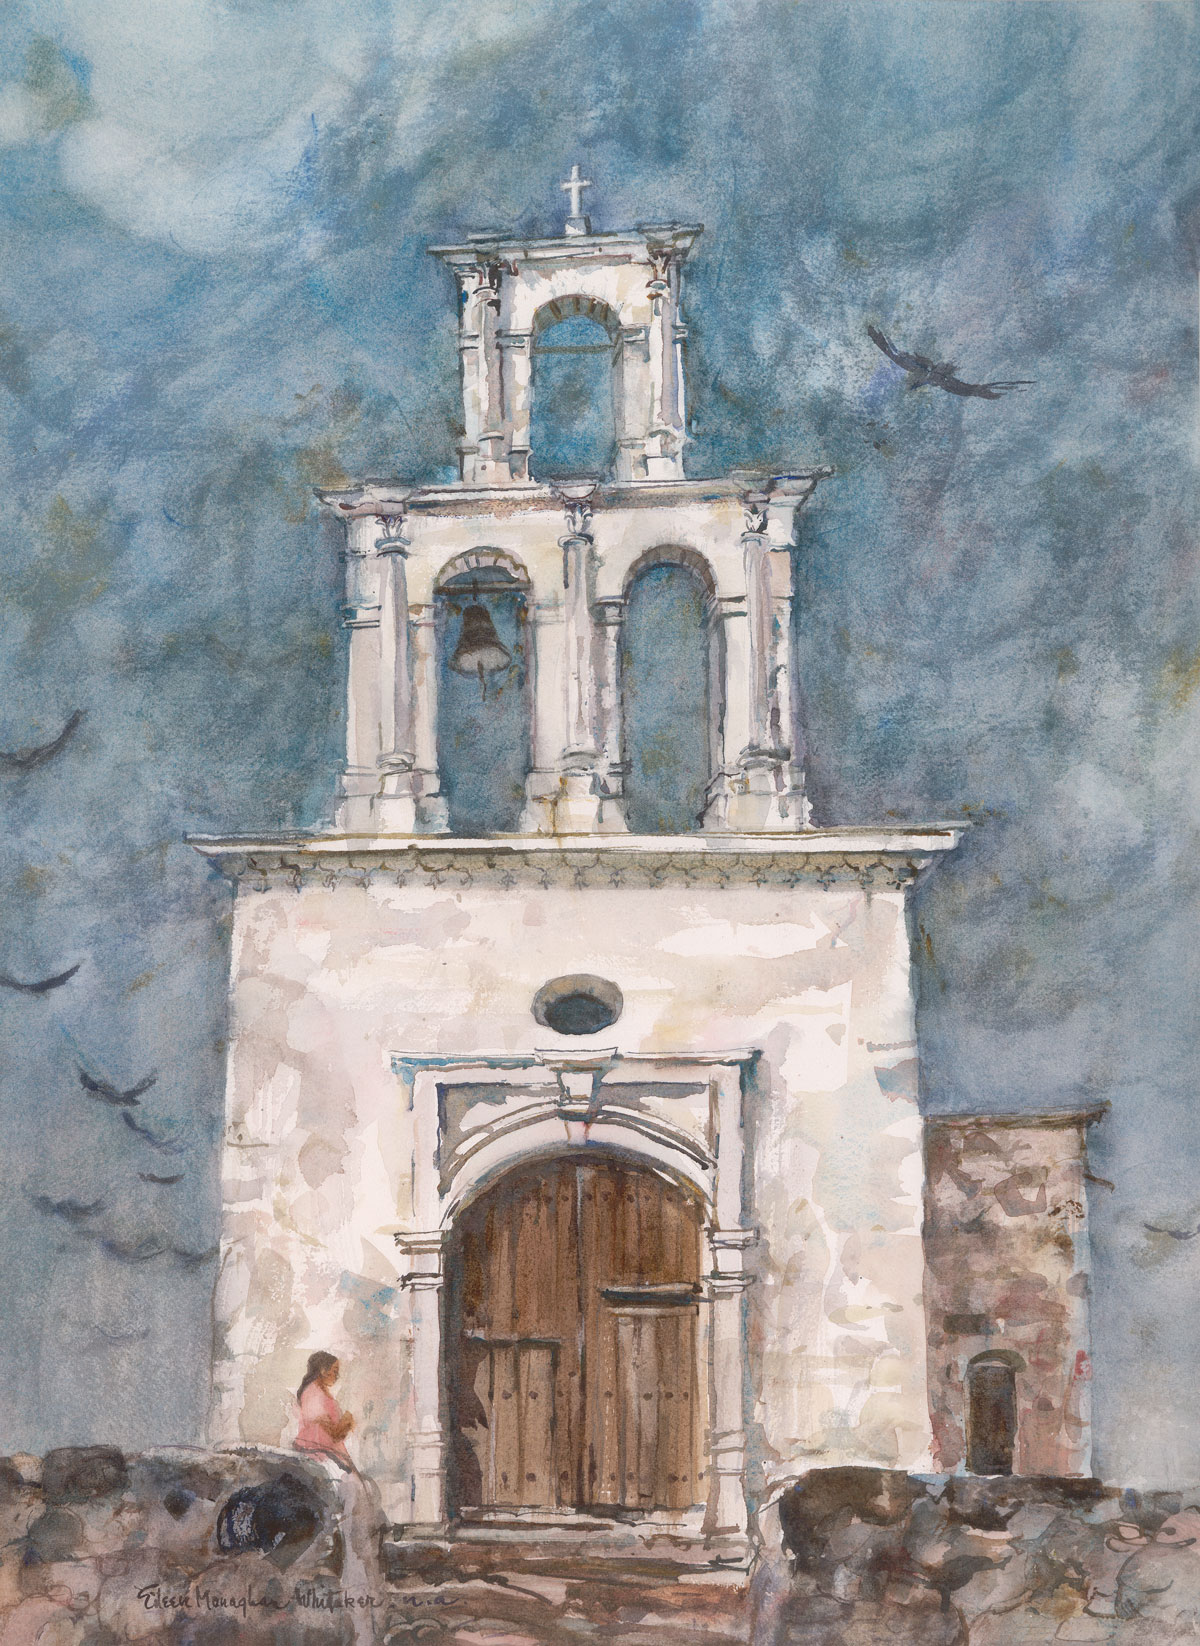 """Capilla De Zapopan"" 1978 © Eileen Monaghan Whitaker N.A. 27.5x22 inches Watercolor"